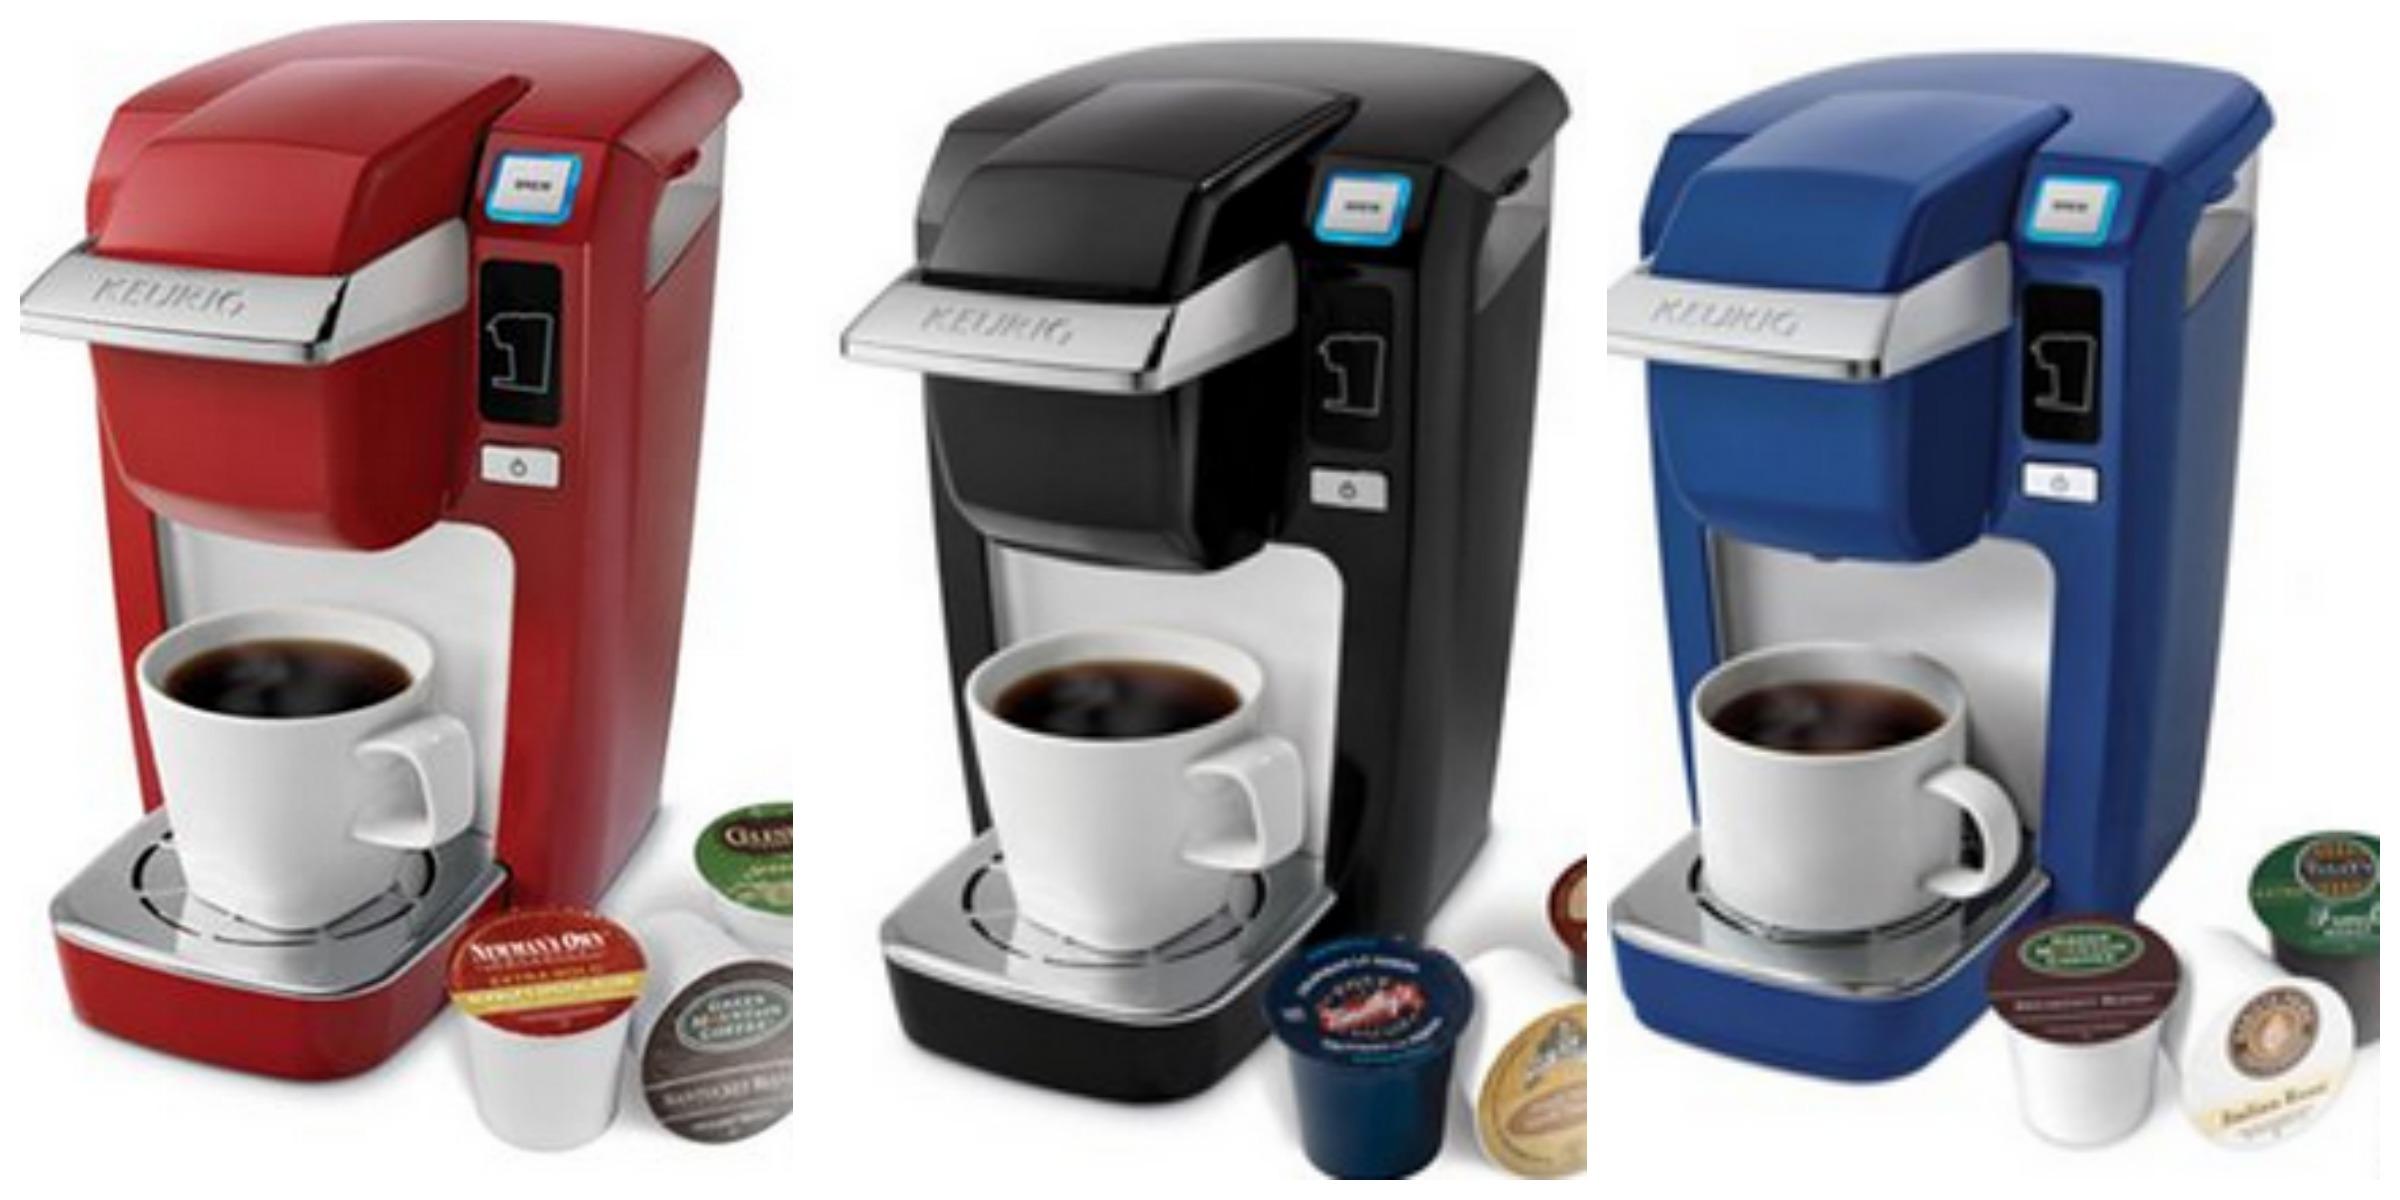 Keurig Coffee Maker Black Friday Deals 2015 : Black Friday Keurig Deals 2013 Male Models Picture